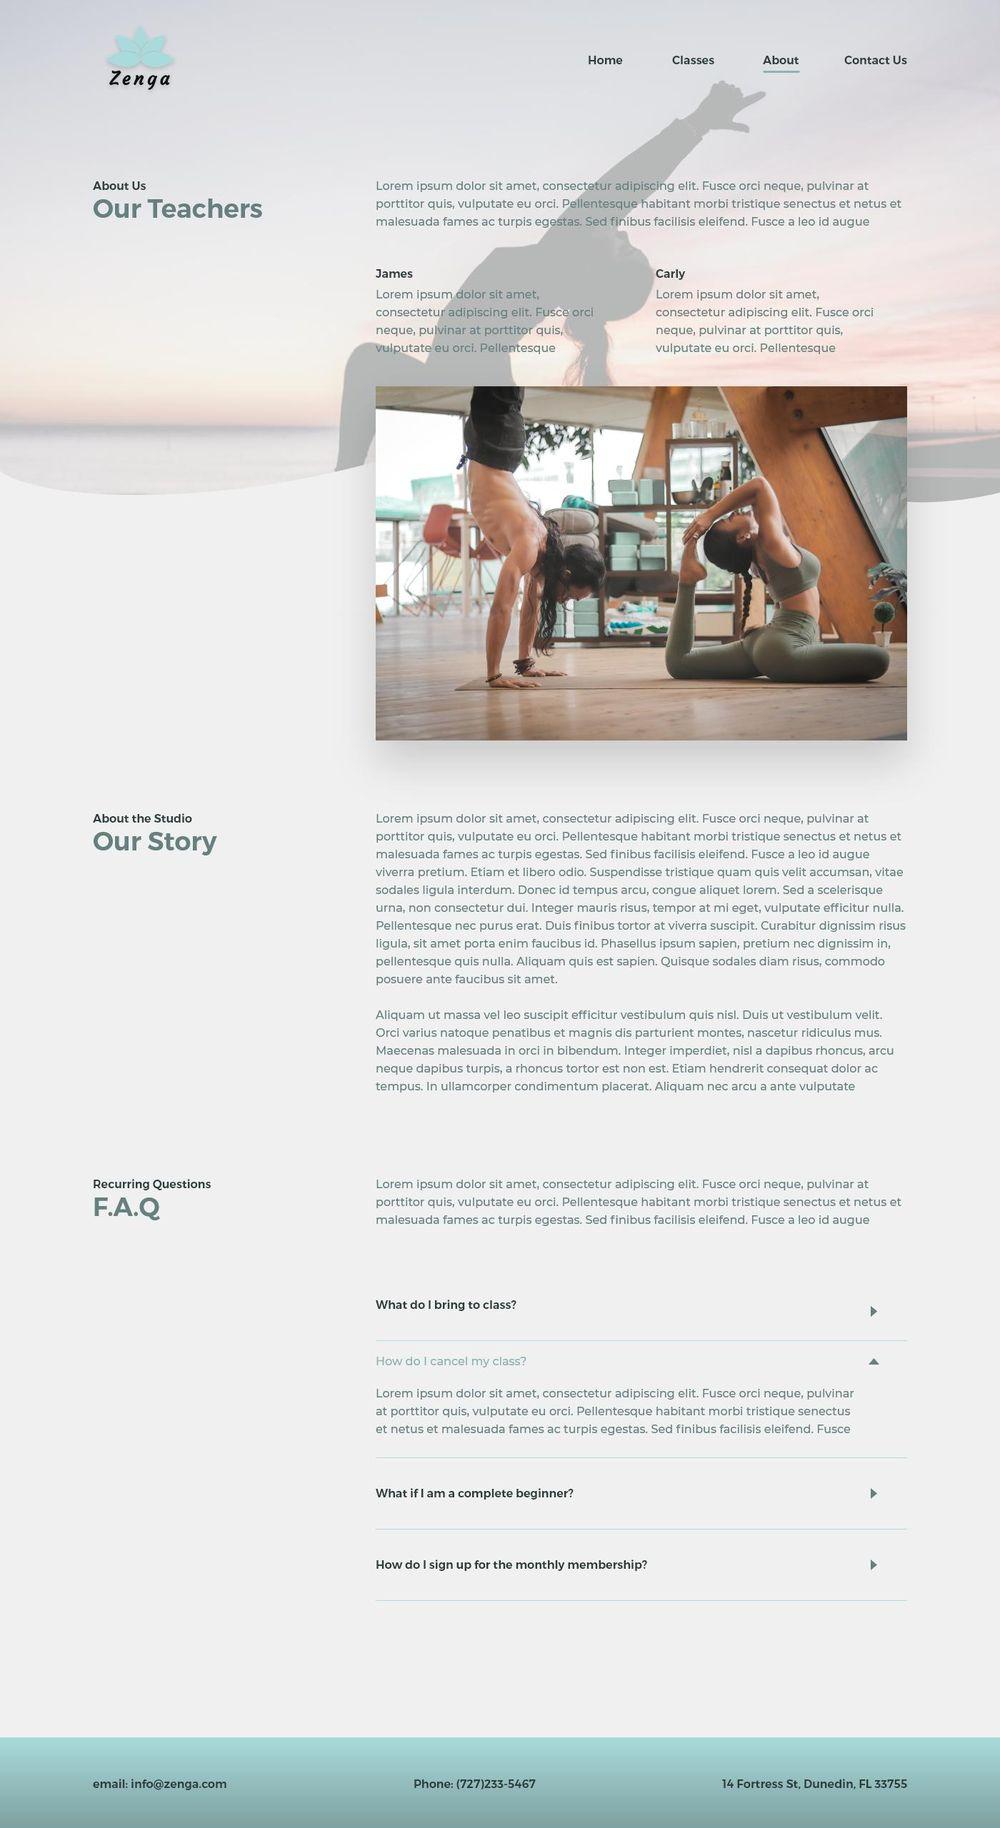 Yoga Studio Website Design - image 4 - student project